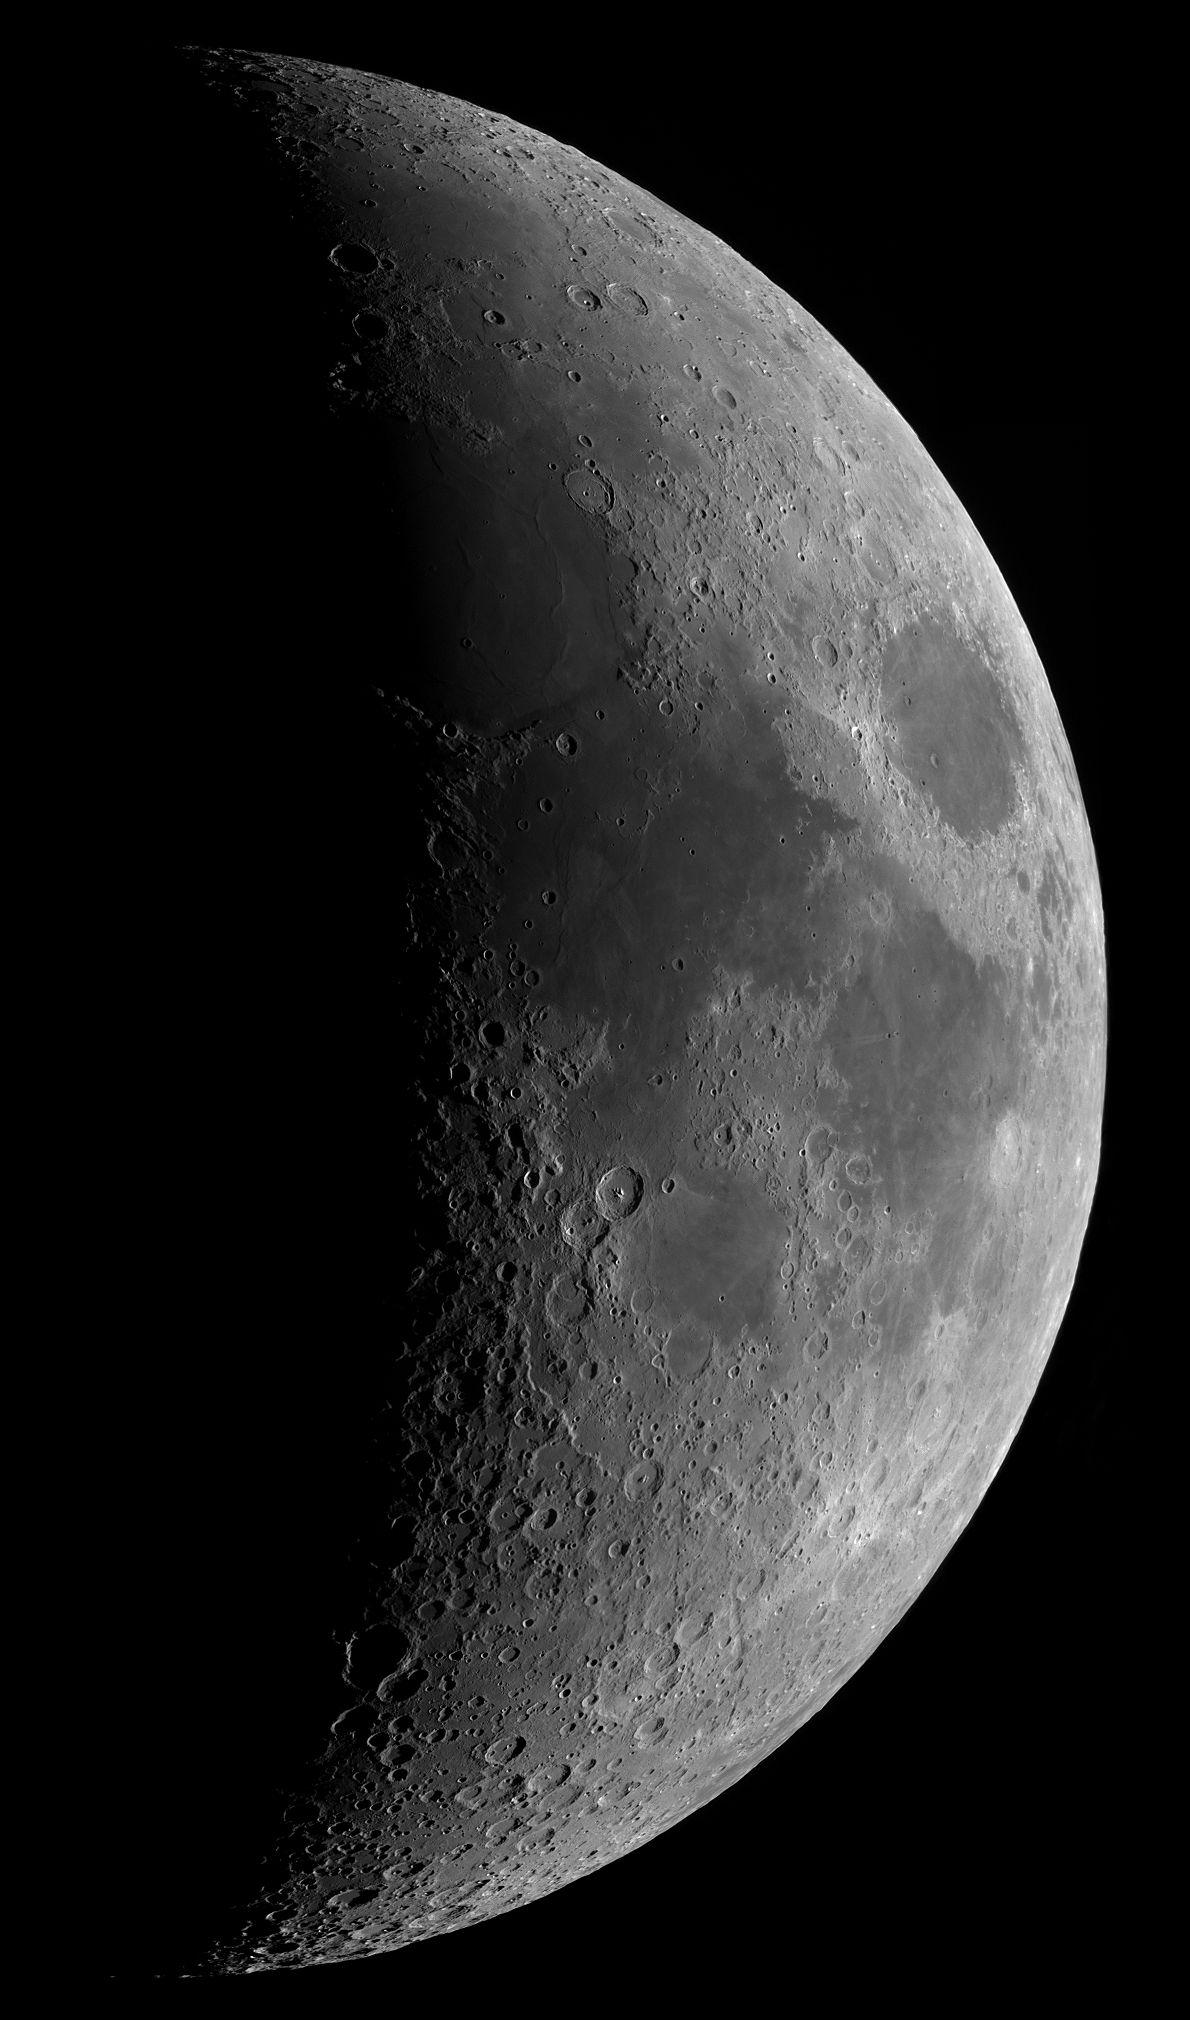 Moon_100519_213630p50c.jpg